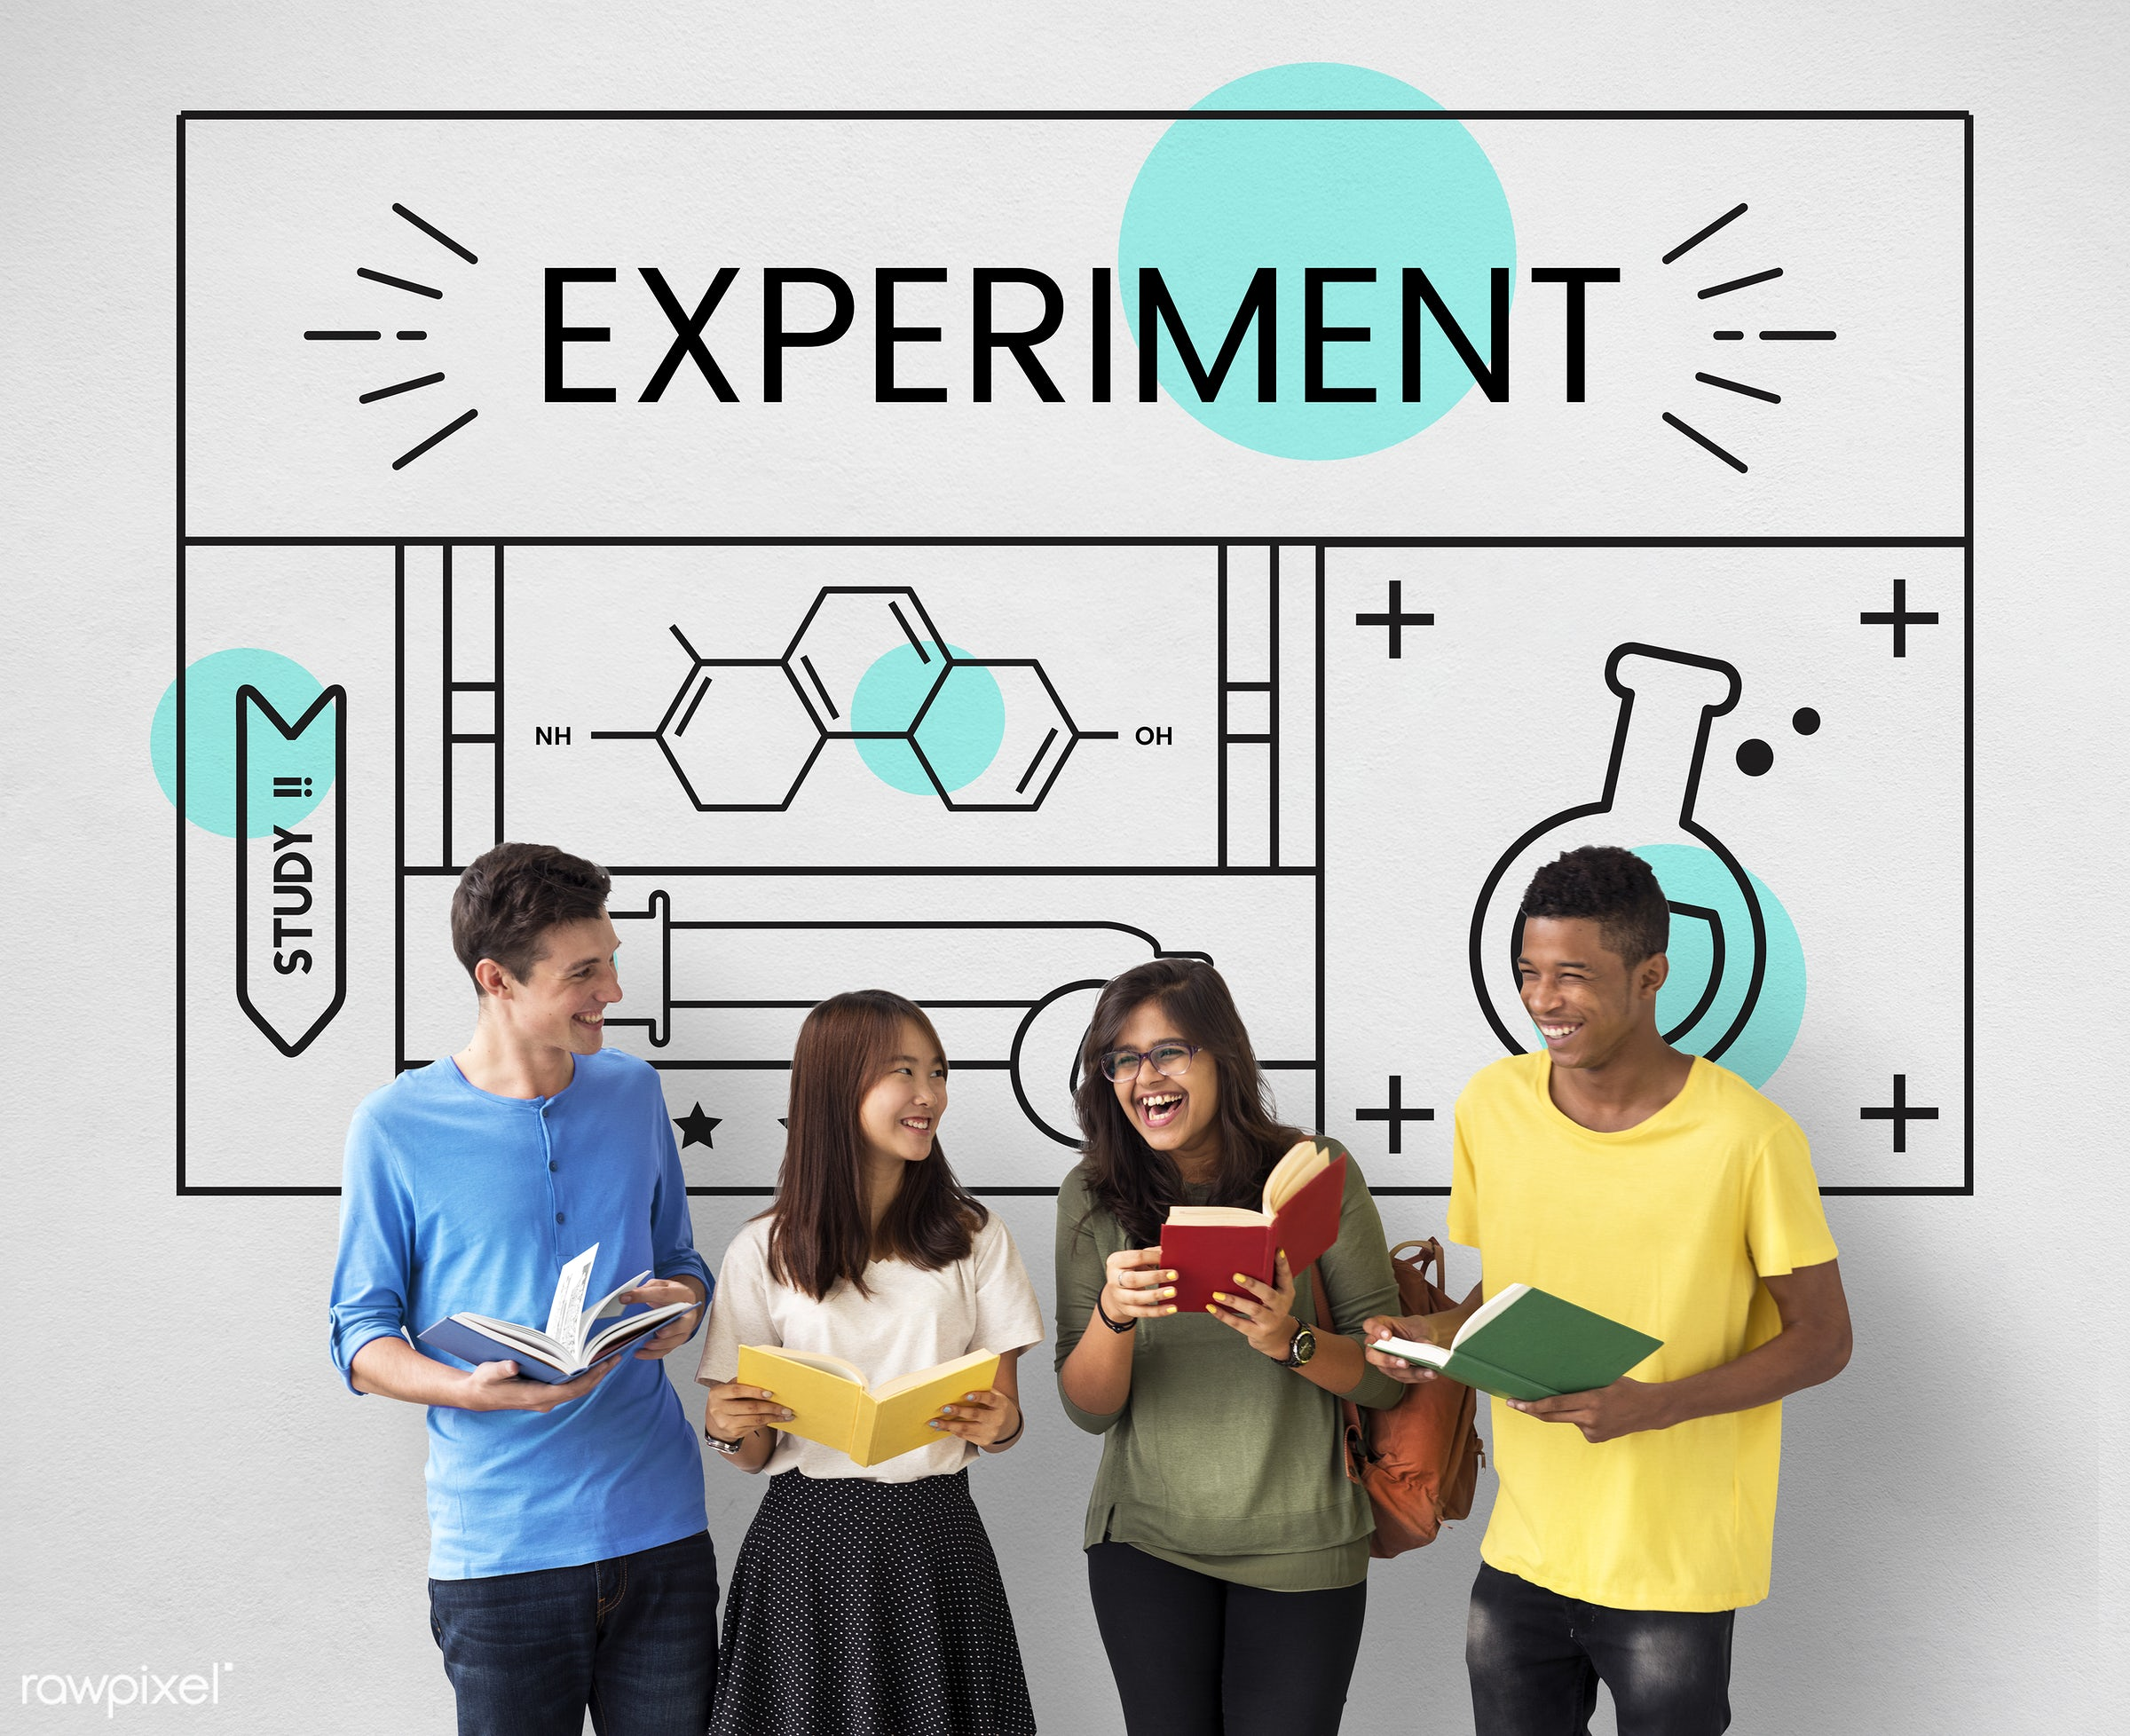 african descent, asian, book, caucasian, chemical, chemistry, diversity, education, enjoyment, experiment, formula, friends...